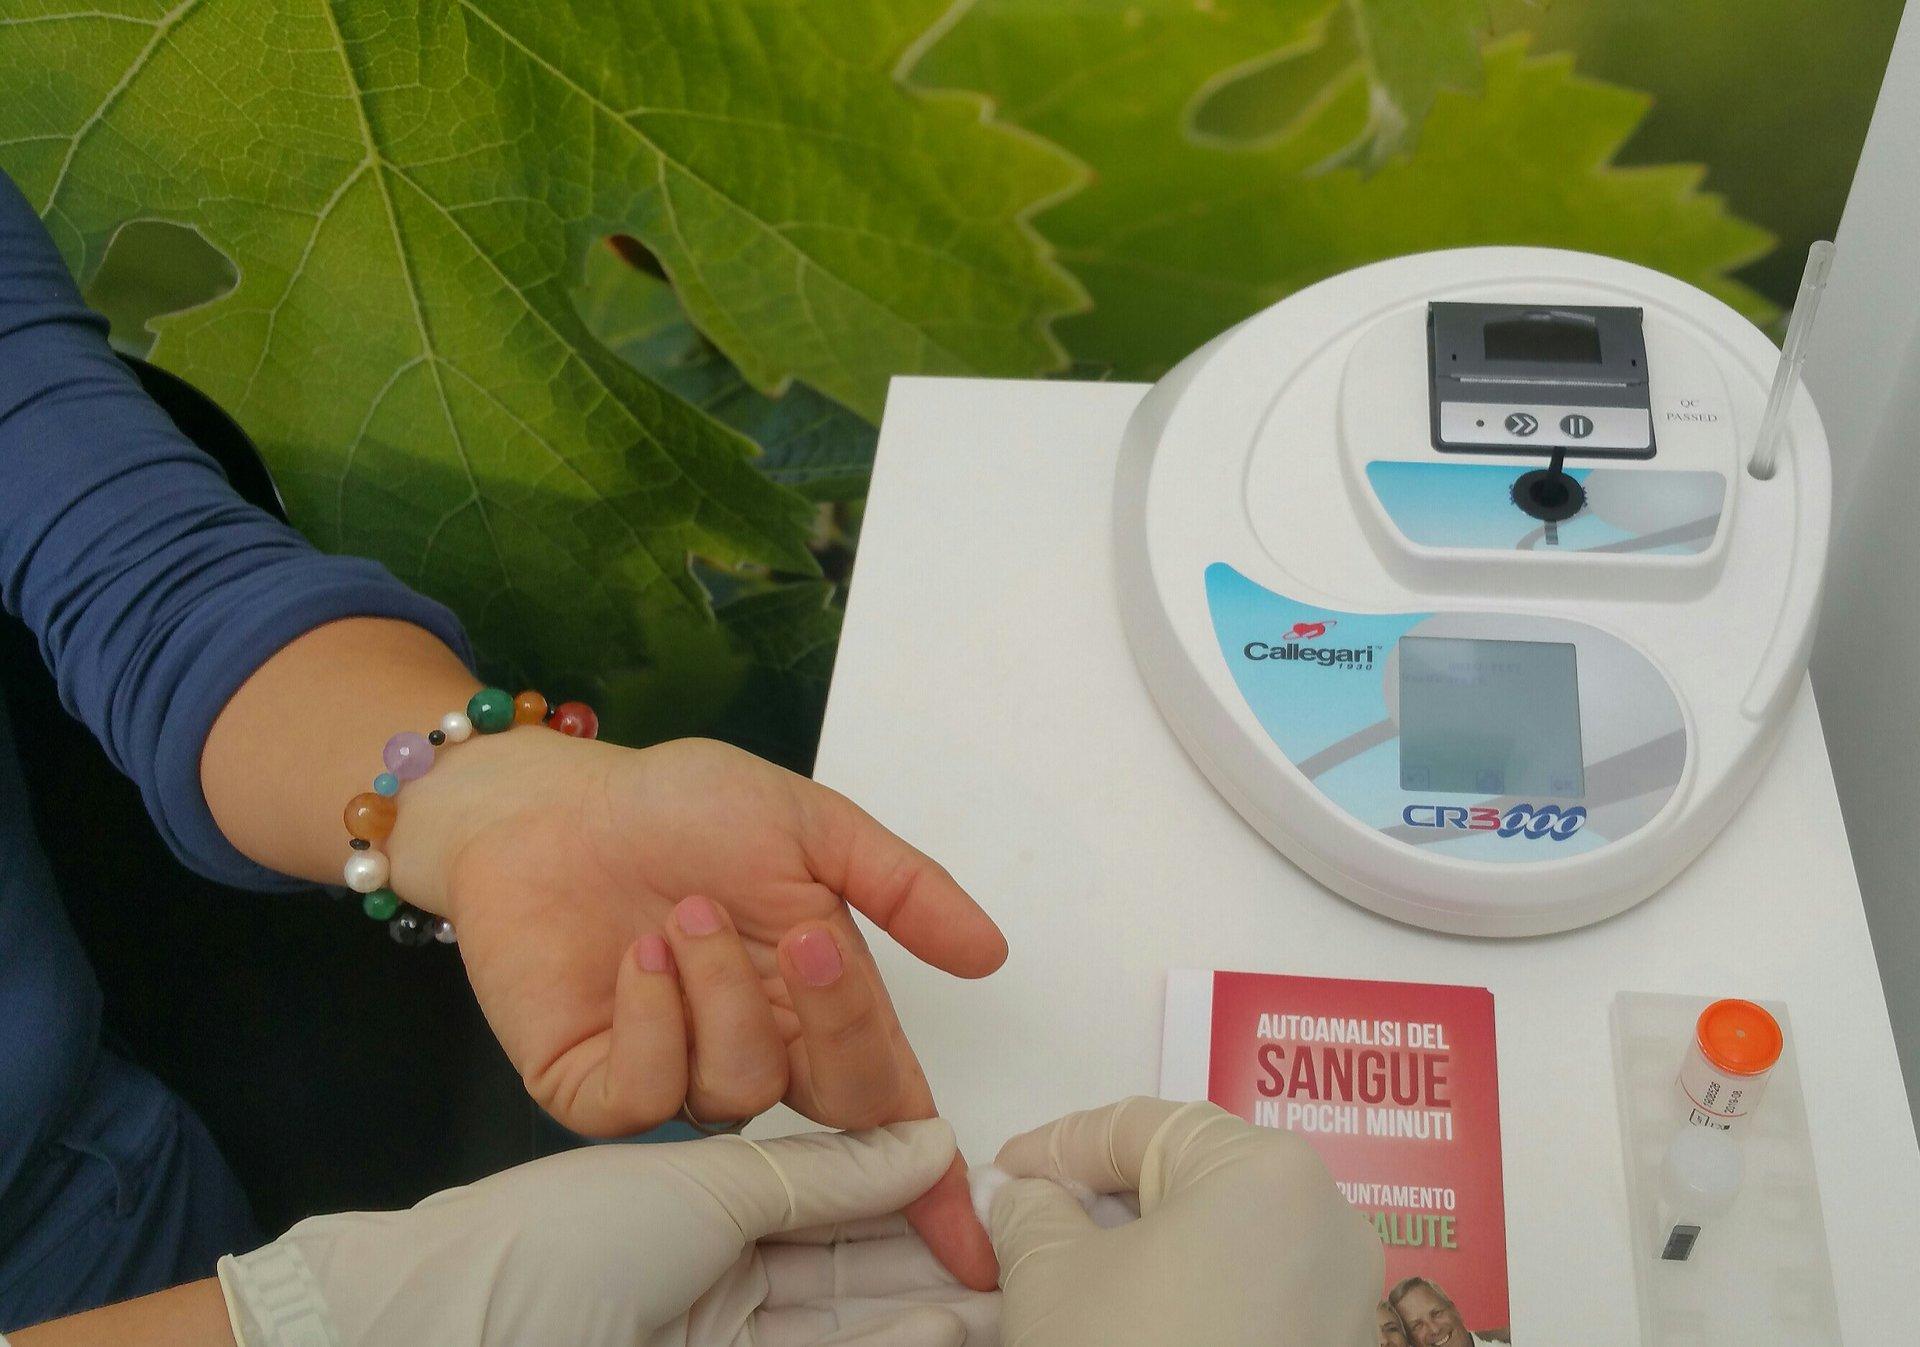 analisi del sangue in farmacia